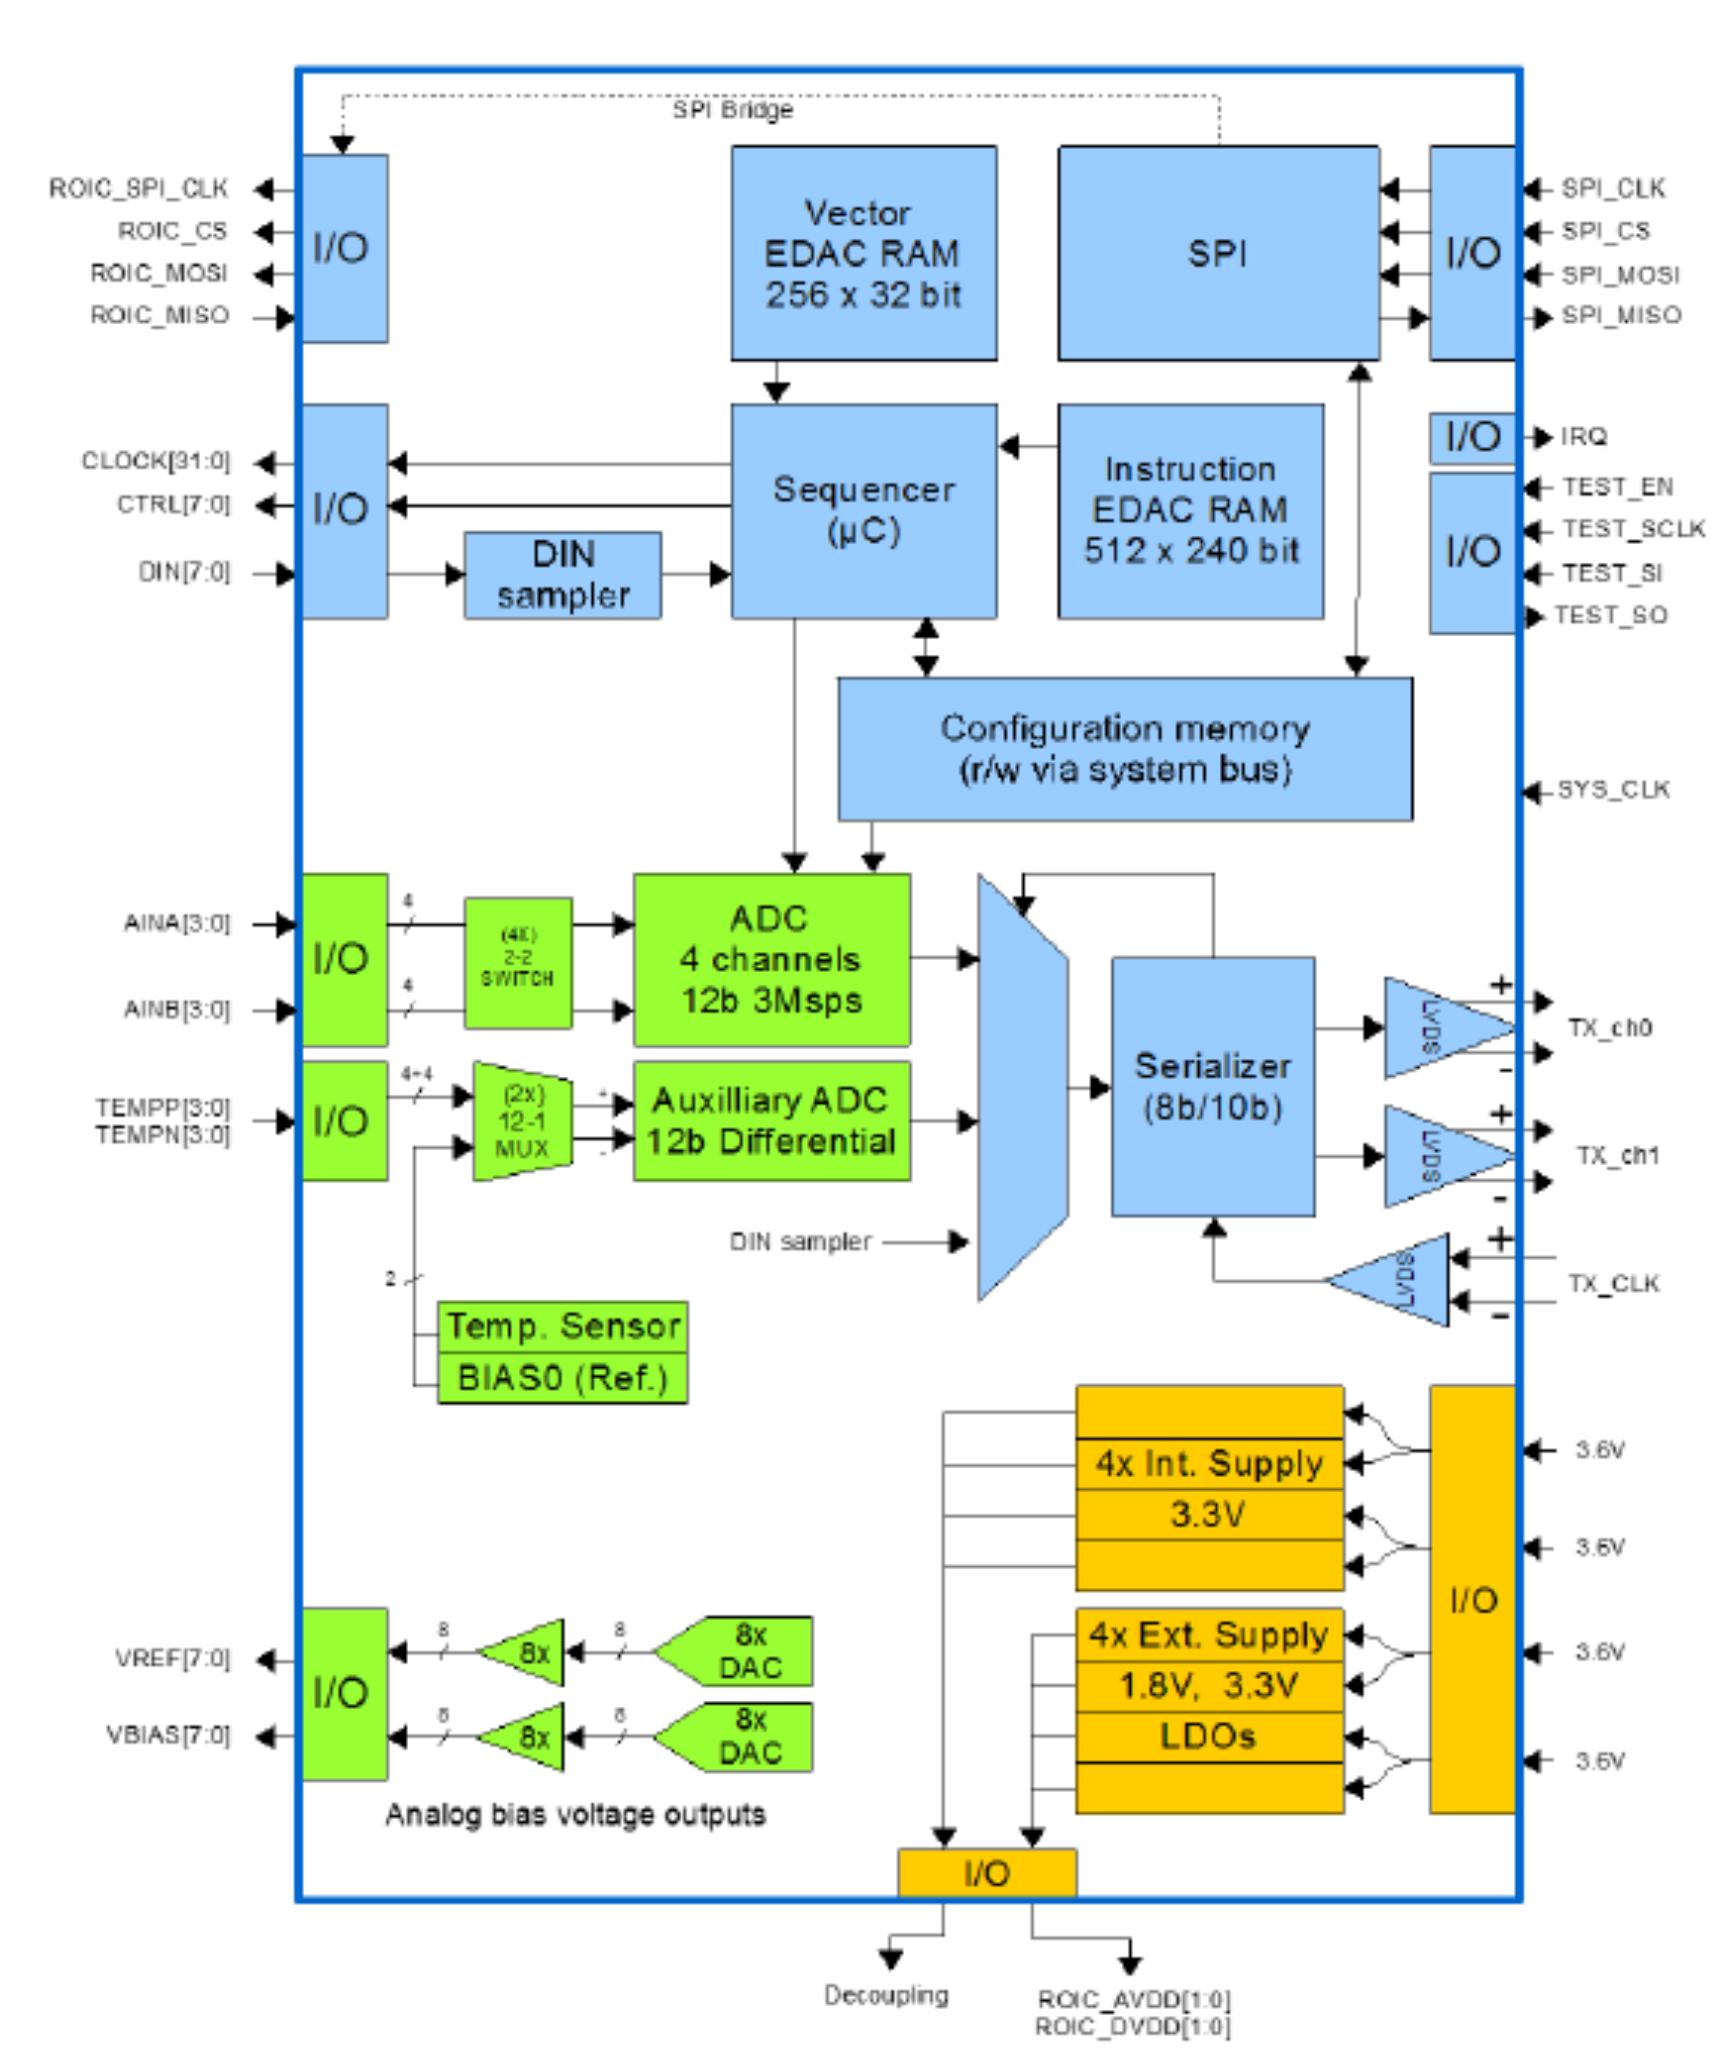 Space in Images - 2017 - 06 - ASIC block diagram